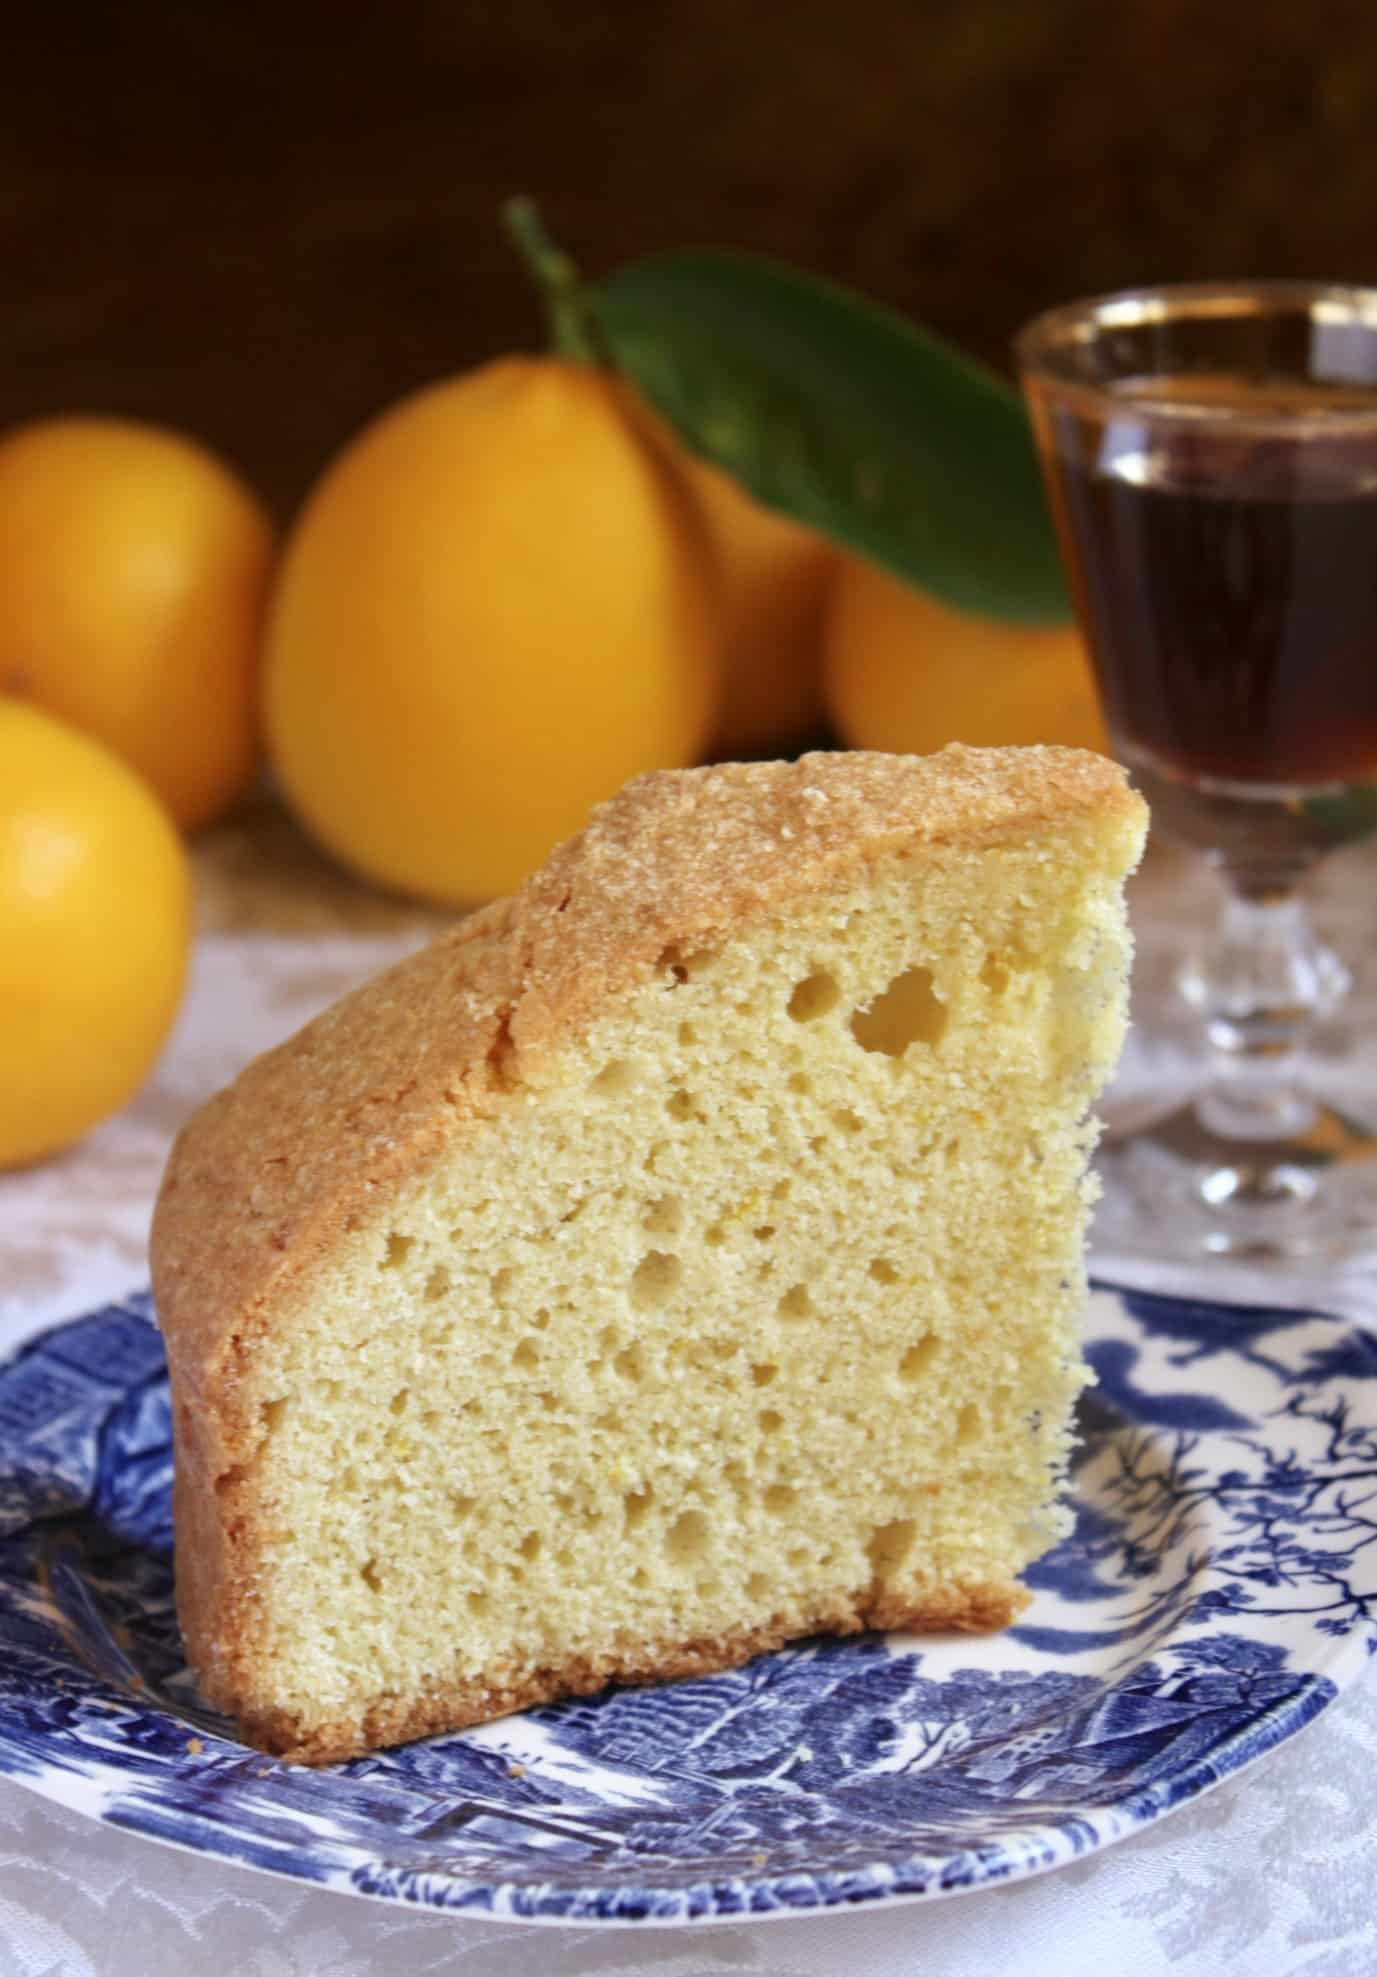 Madeira cake with glass of Madeira wine